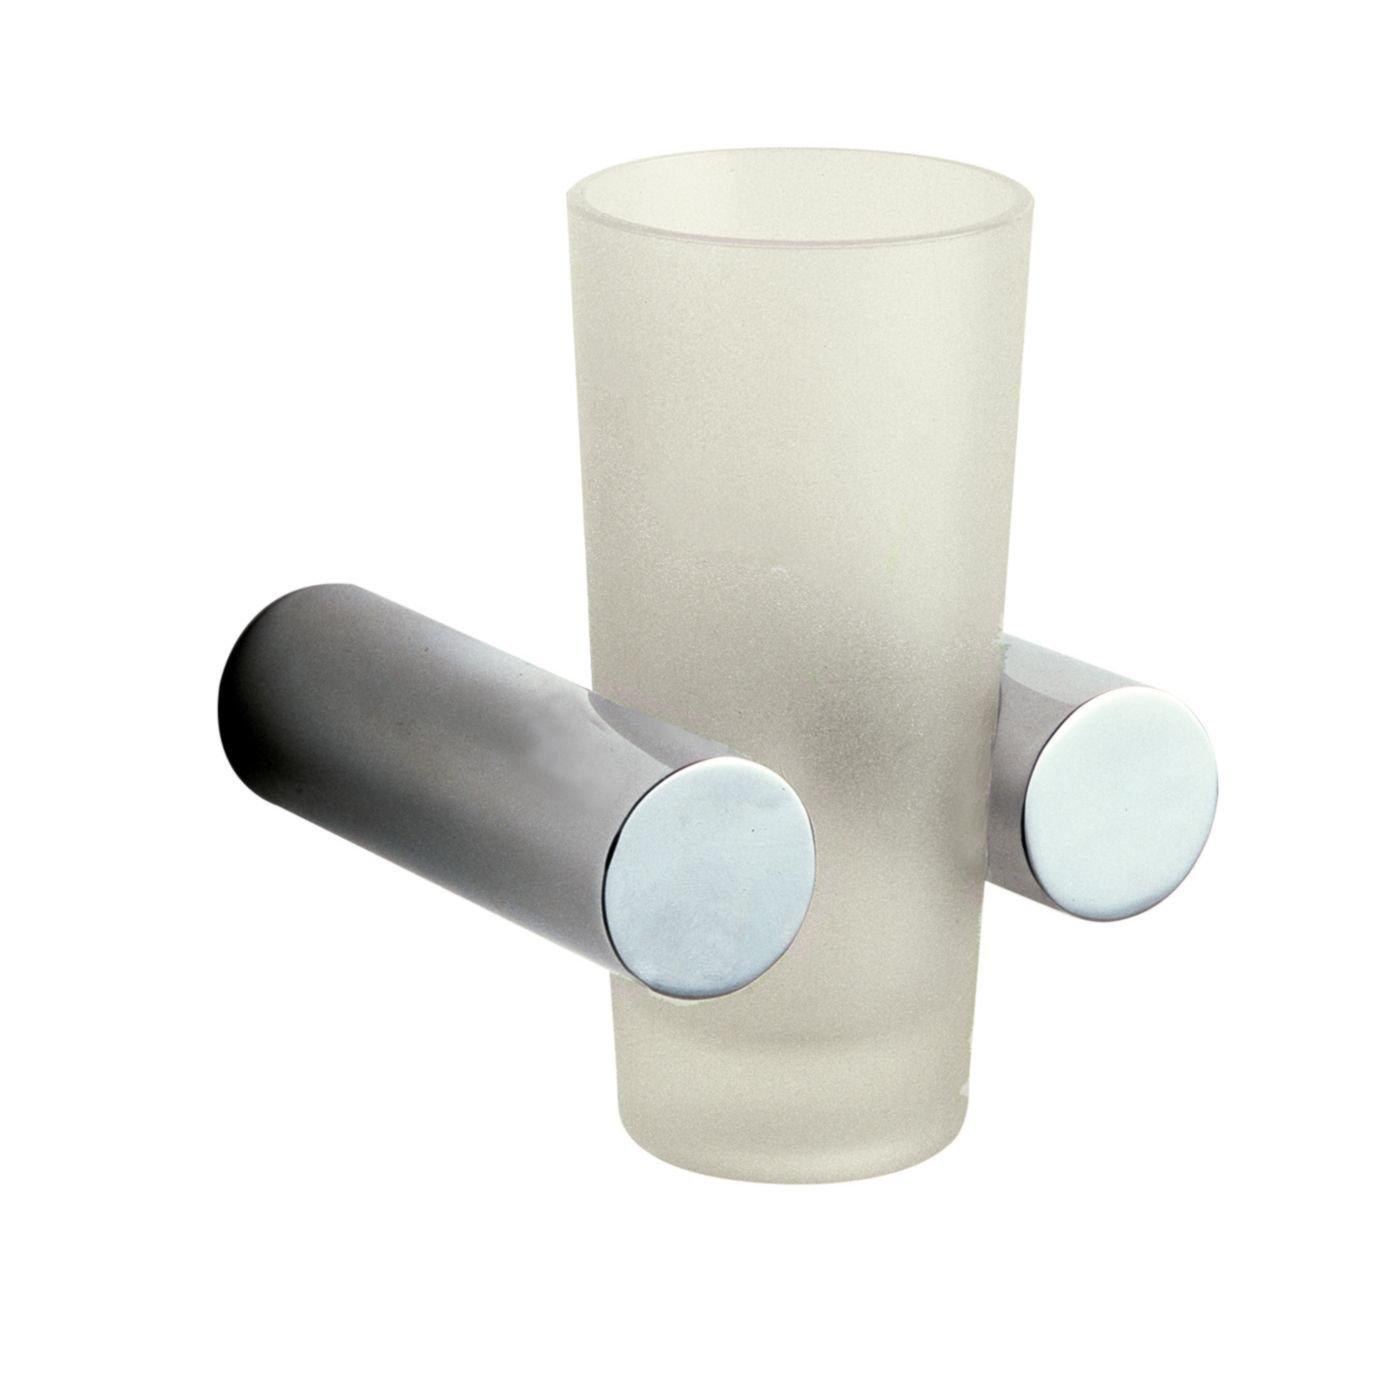 Hudson Reed Minimalist Bathroom Tumbler Holder Attractive Chrome Finish Accessory Stylish Modern Toothbrush Cup